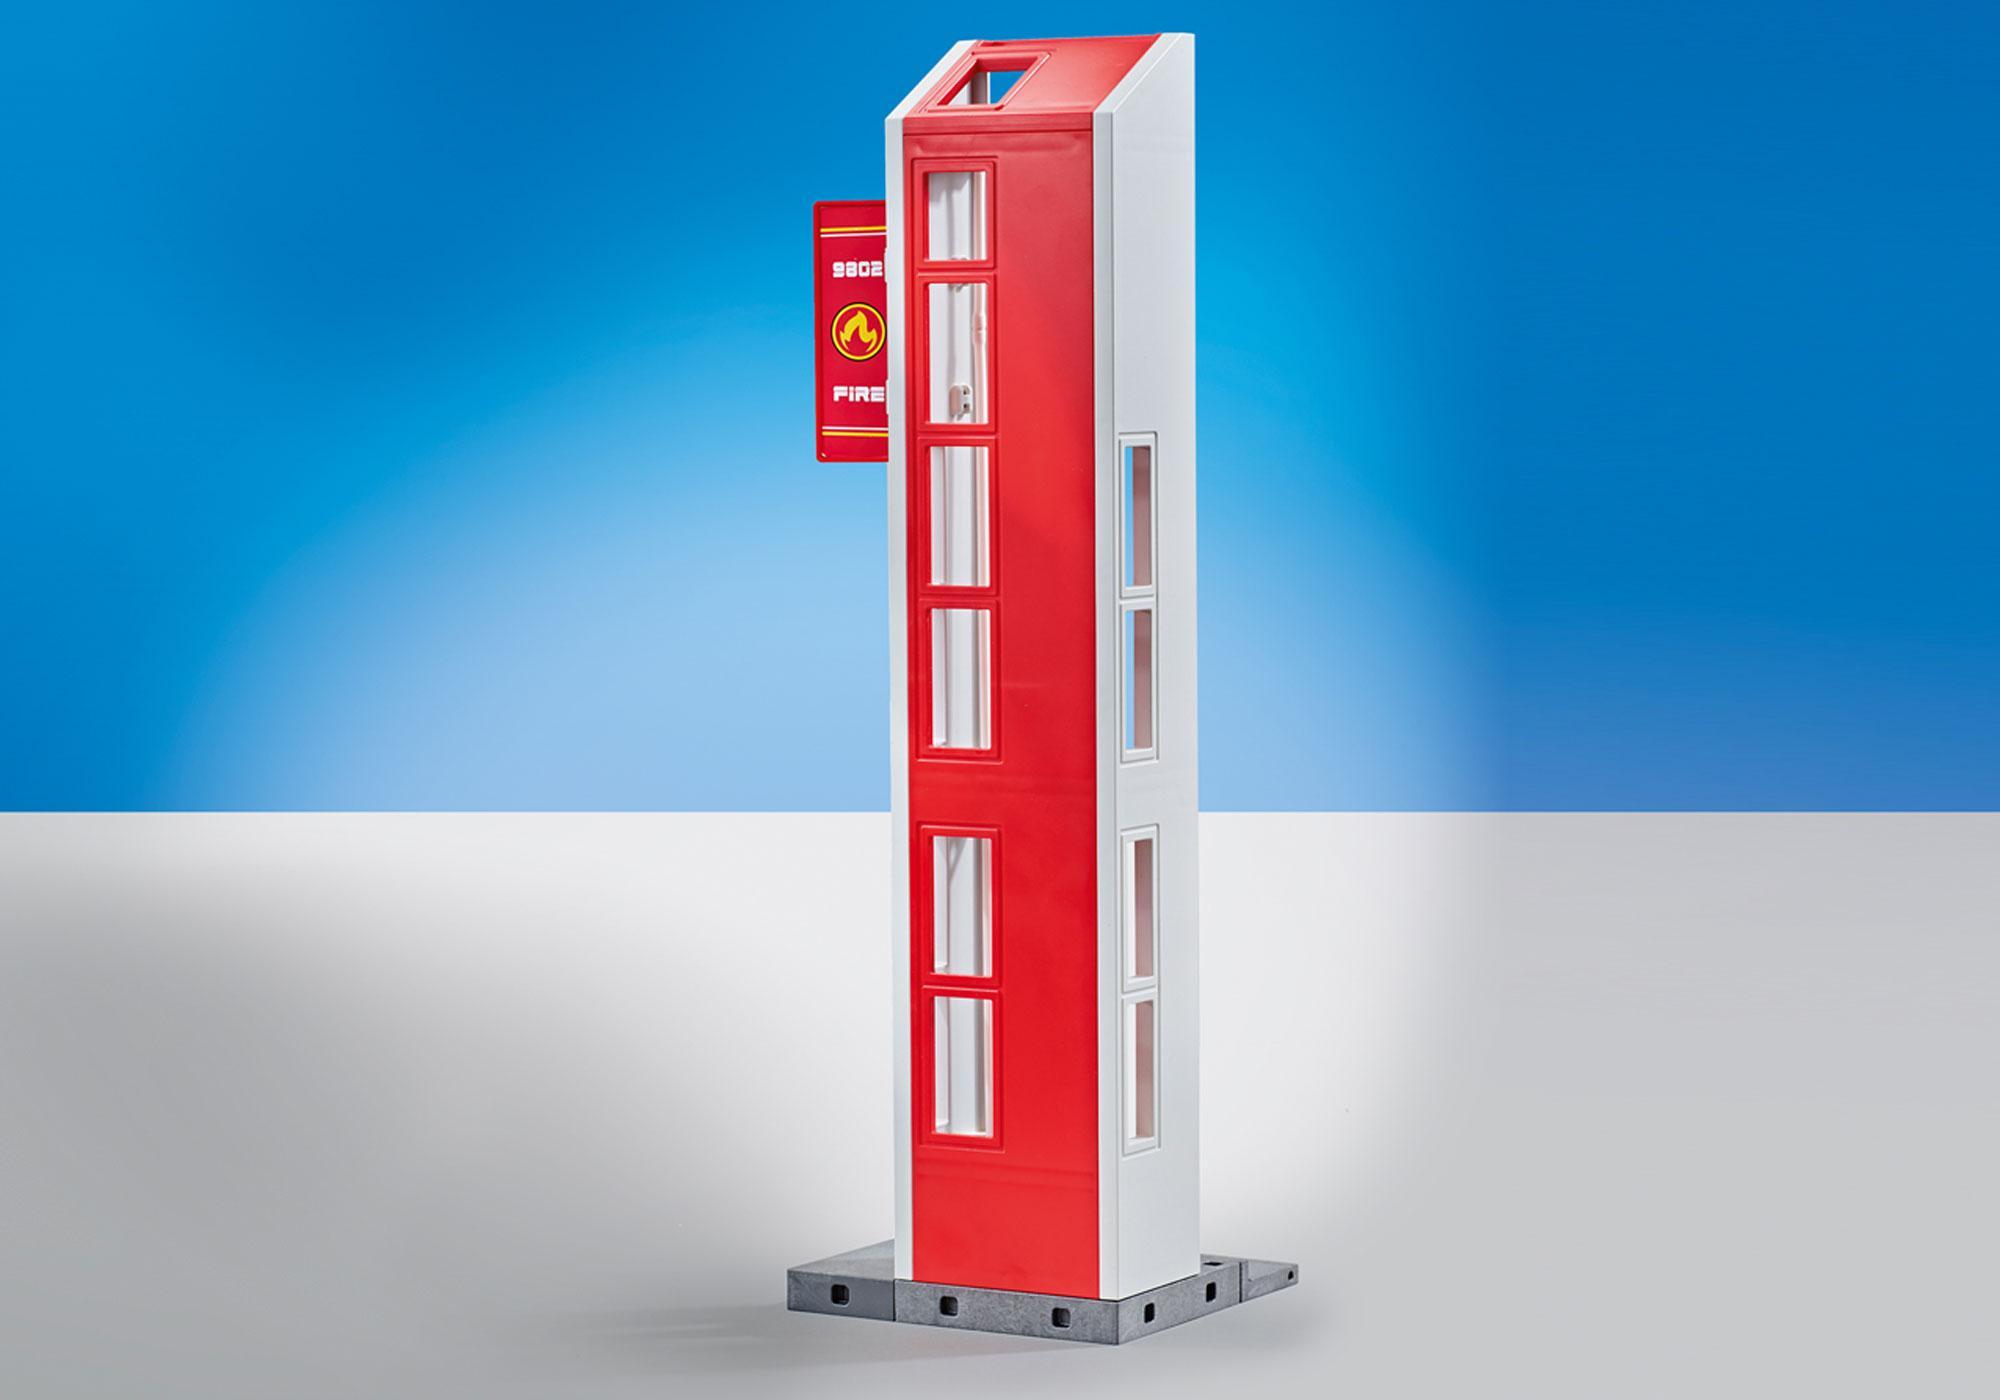 http://media.playmobil.com/i/playmobil/9802_product_detail/Torre para el Parque de Bomberos